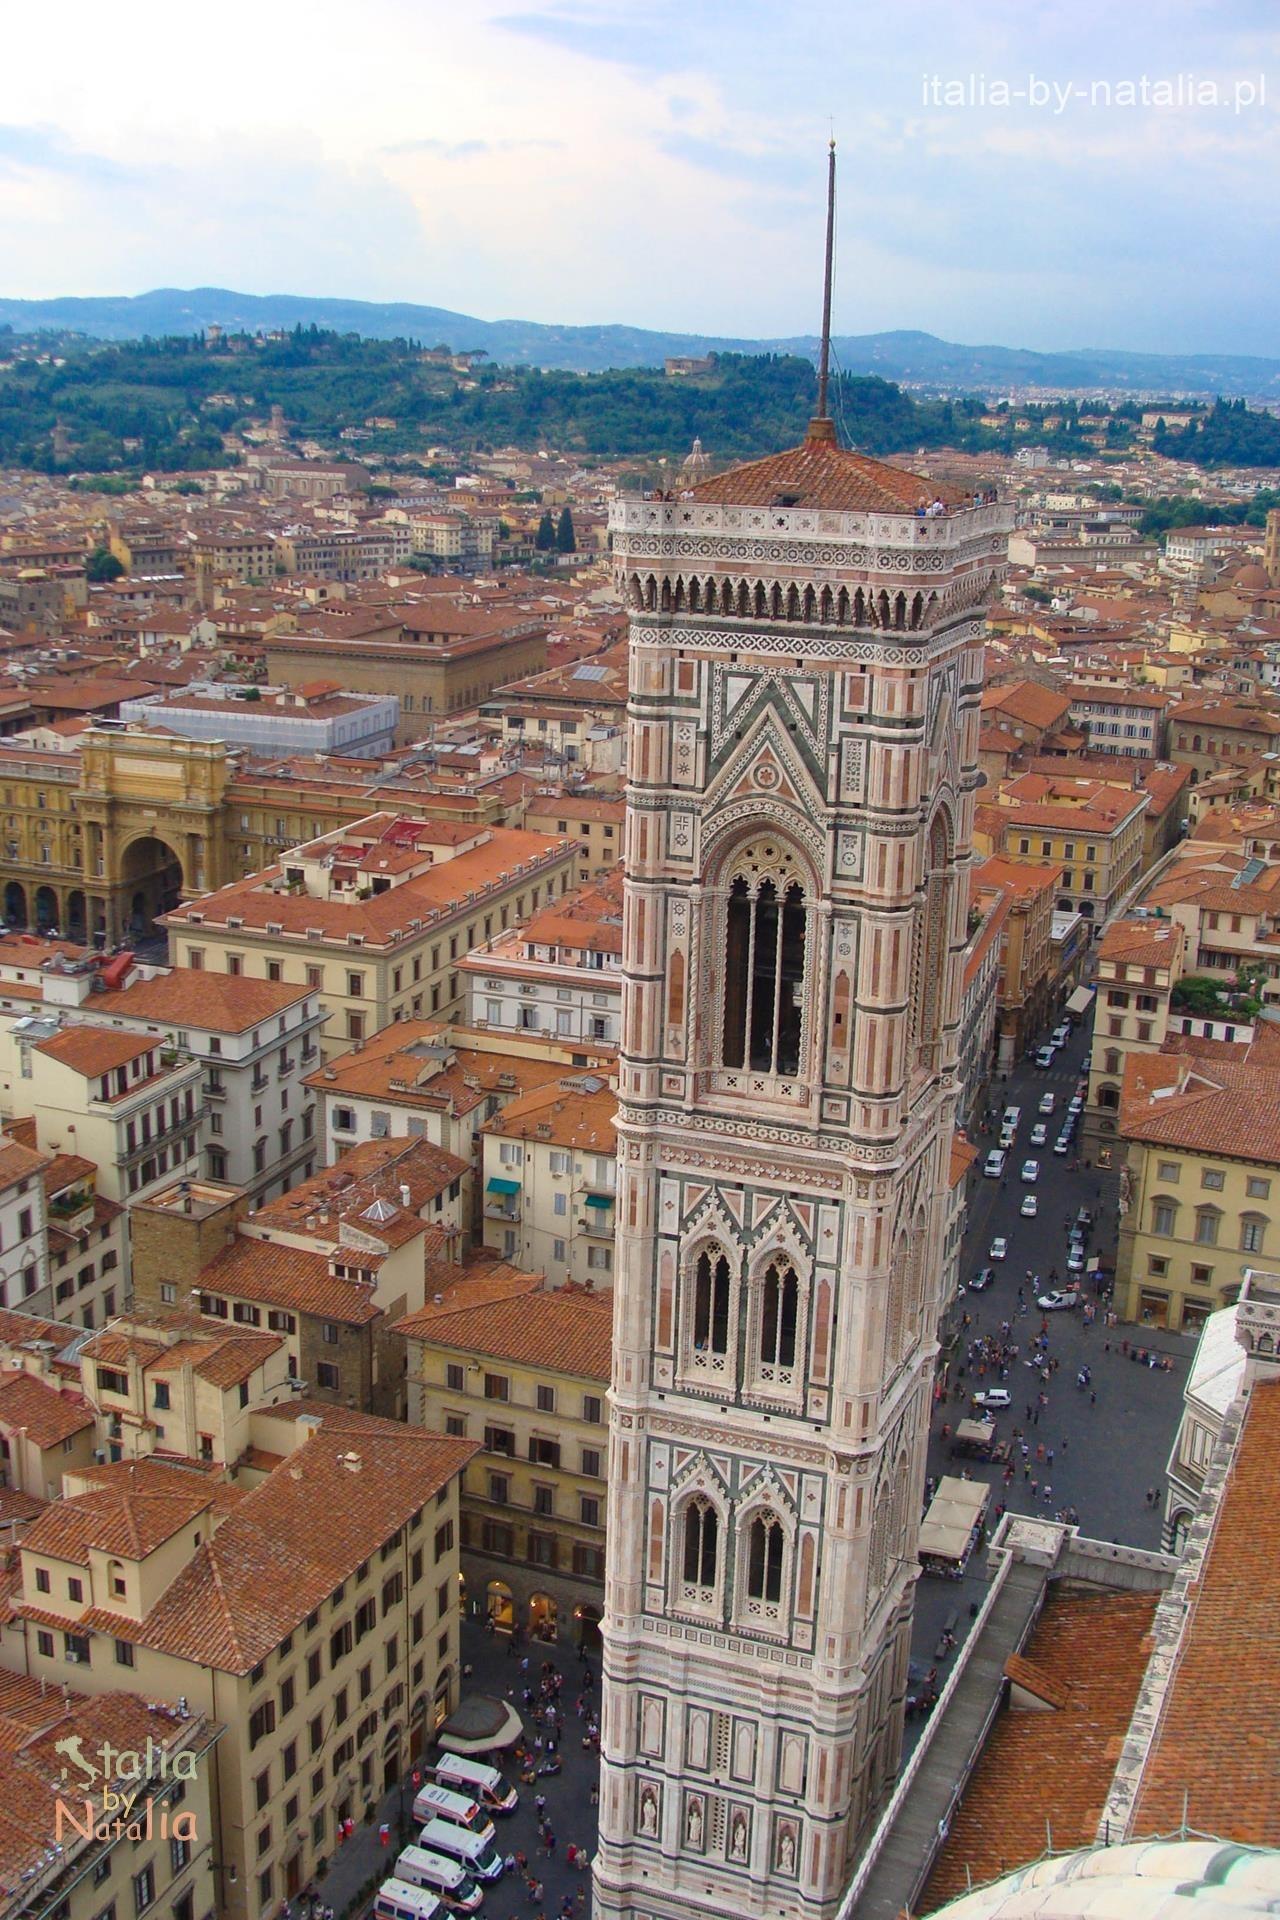 Florencja Campanile di Giotto dzwonnica Duomo widok z kopuły bazyliki Santa Maria del Fiore